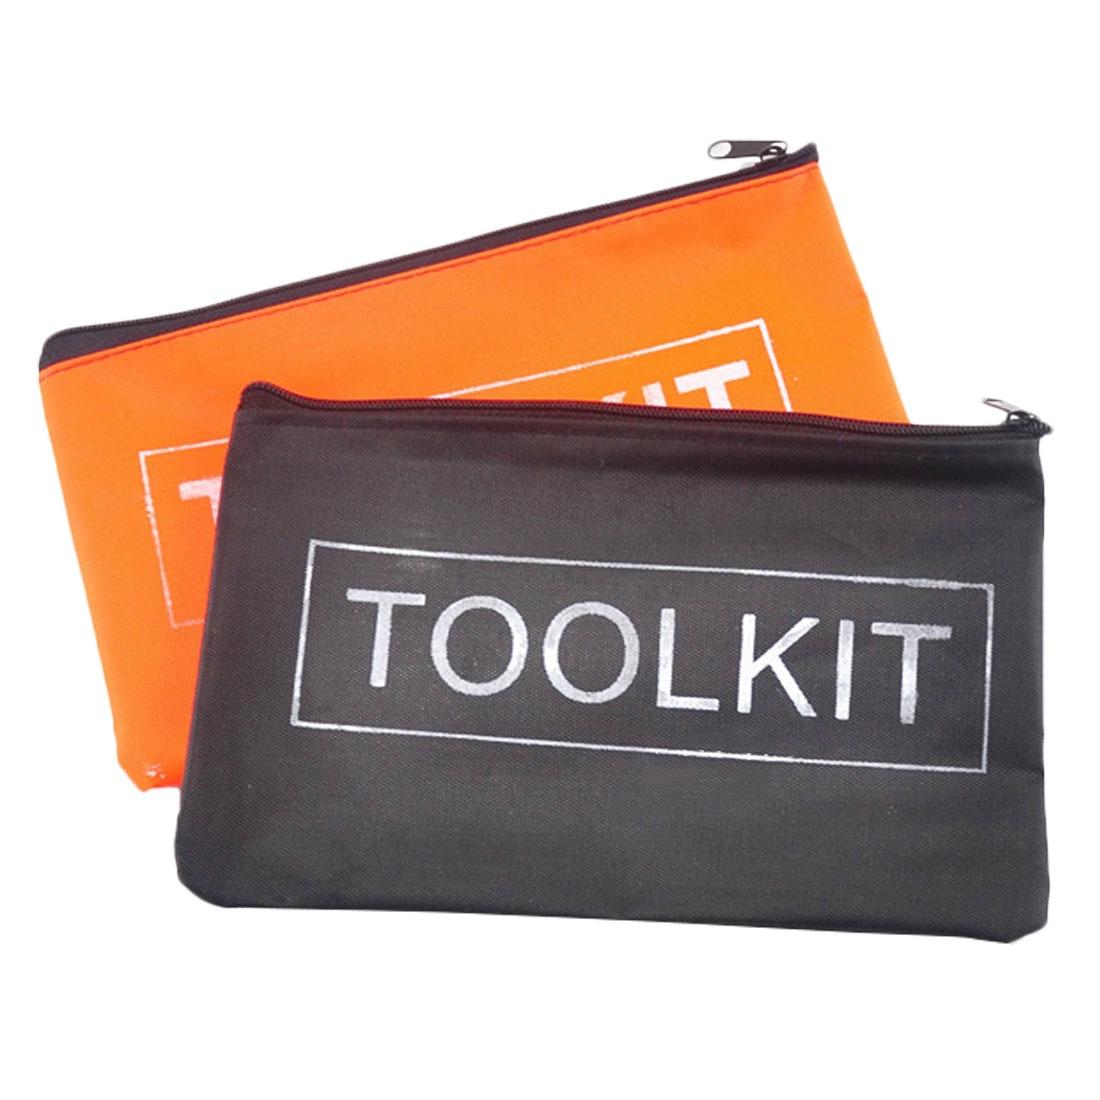 19x11cm  Mini Tool Kit Bag 600D Oxford Cloth Tool Bag Storage Instrument Case  Universal Size Convenient Hand Tool Bag Pocket